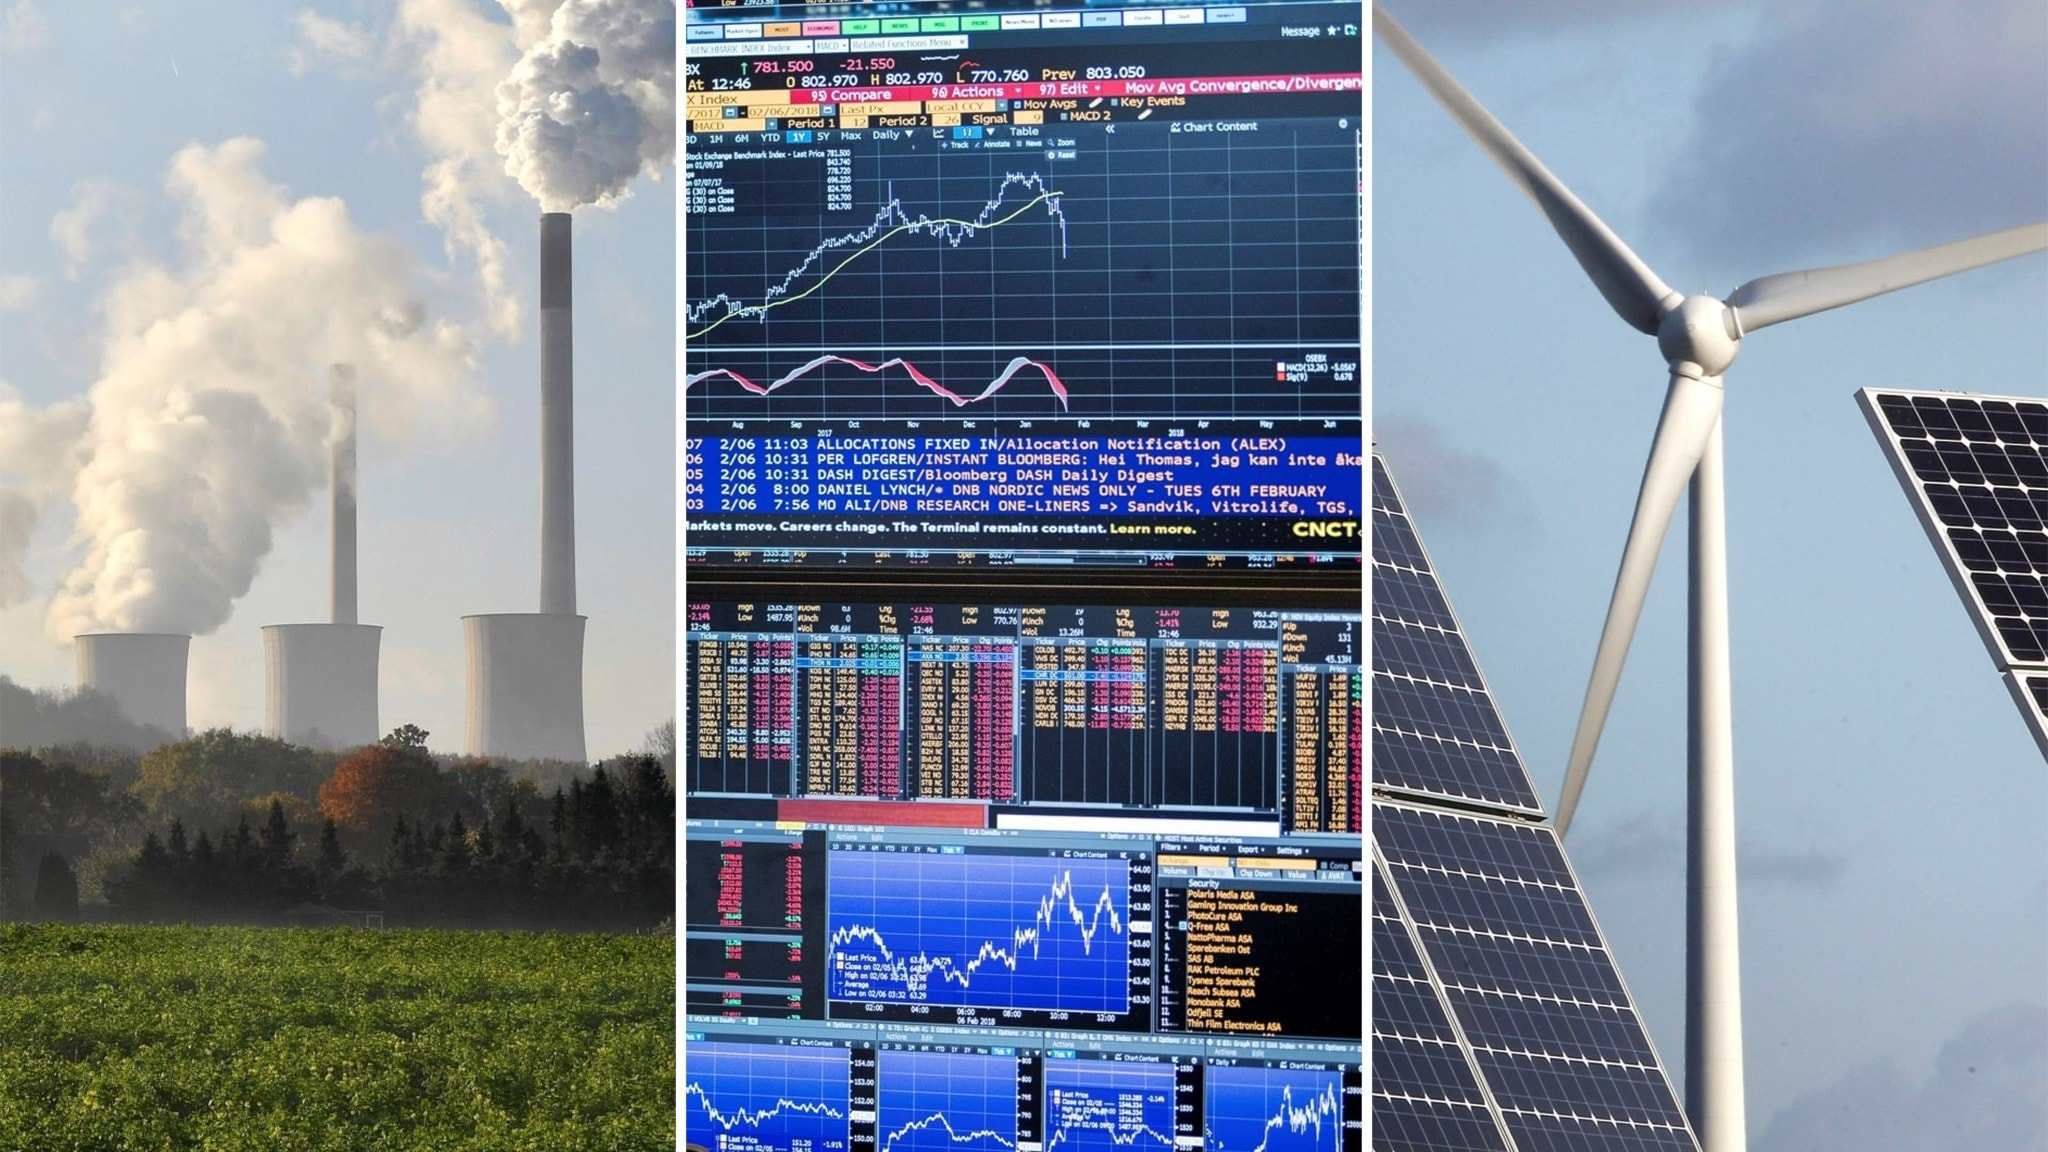 Grönare finanser